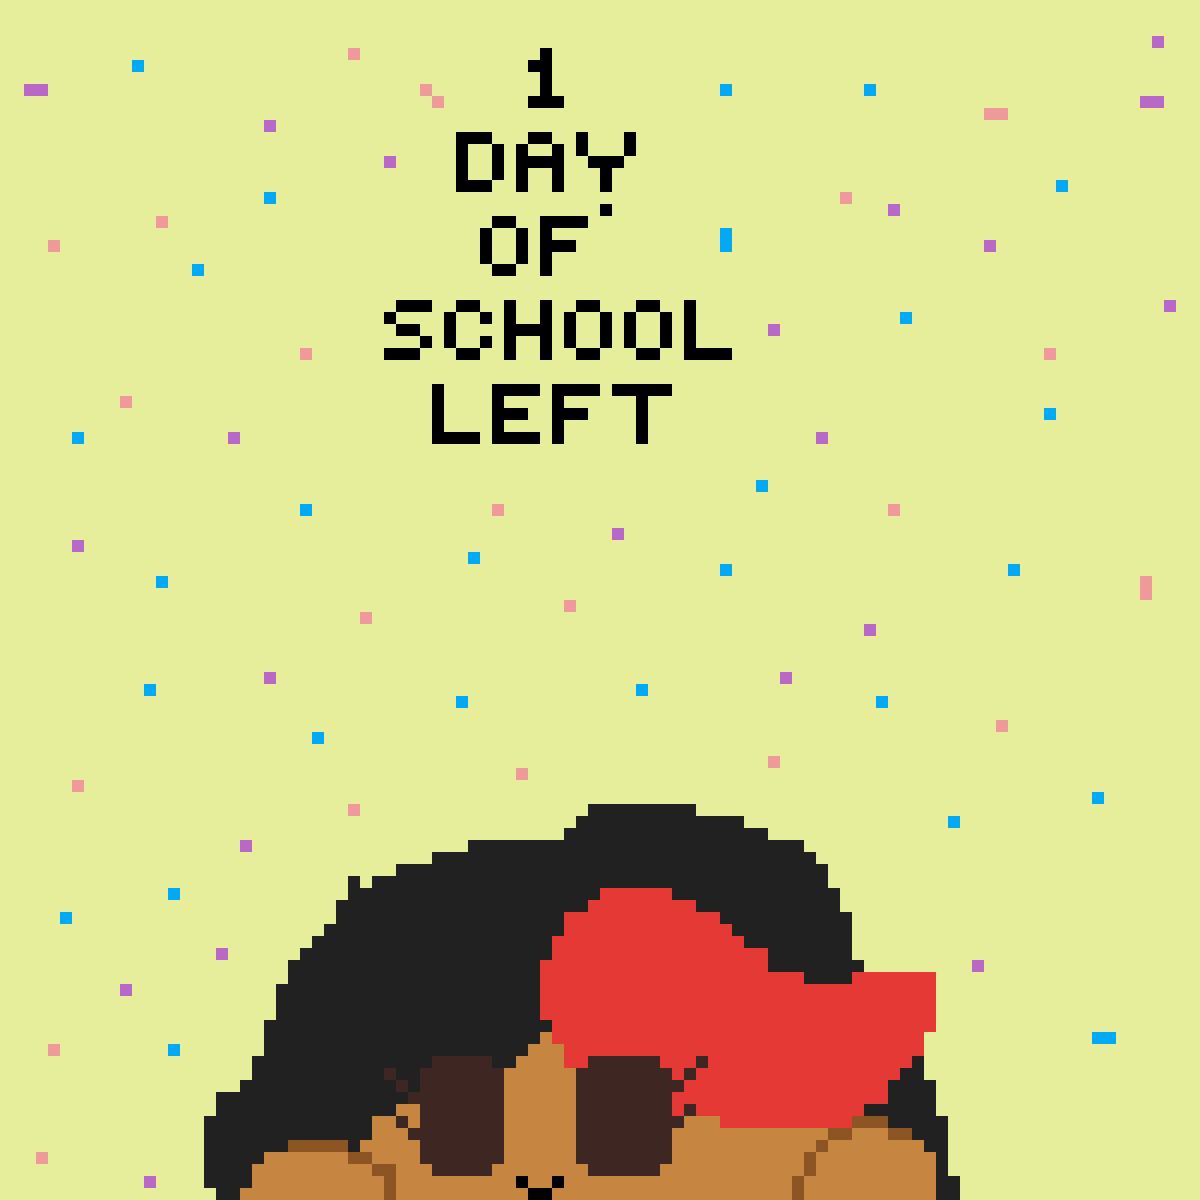 1 day of school left by love-it-mugman